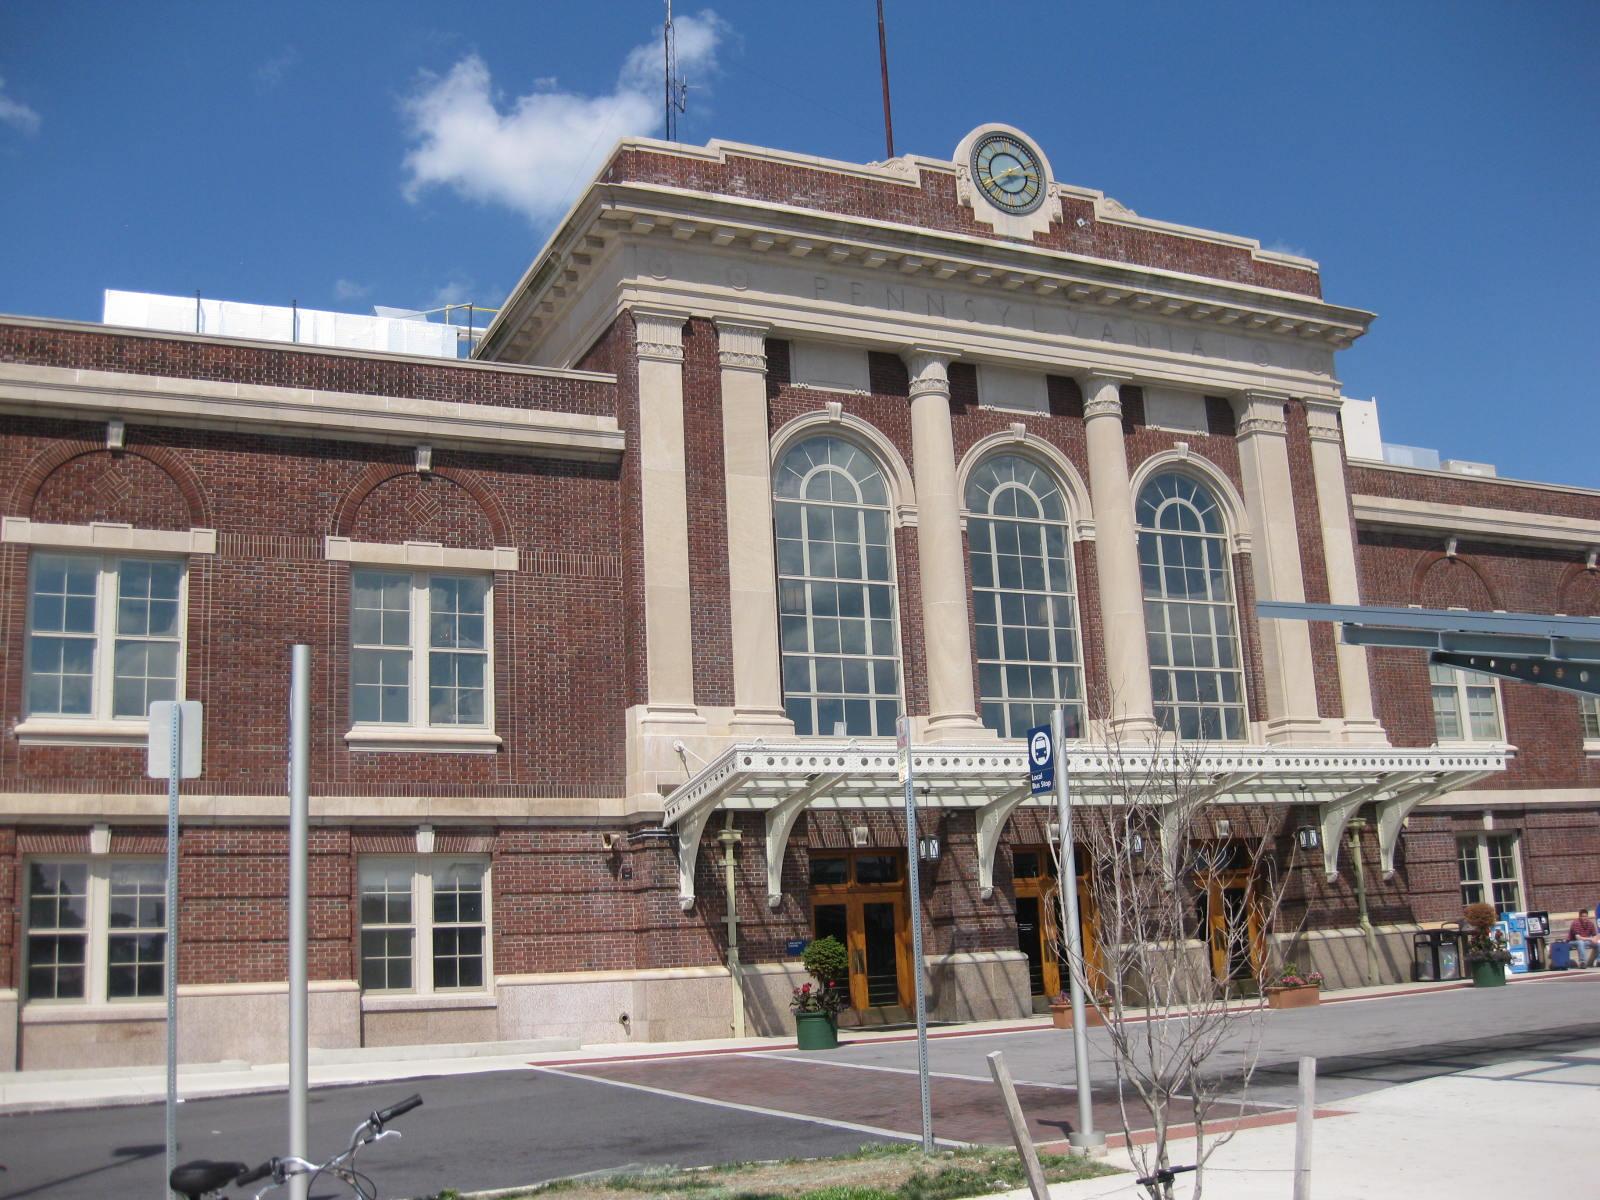 Lancaster train station